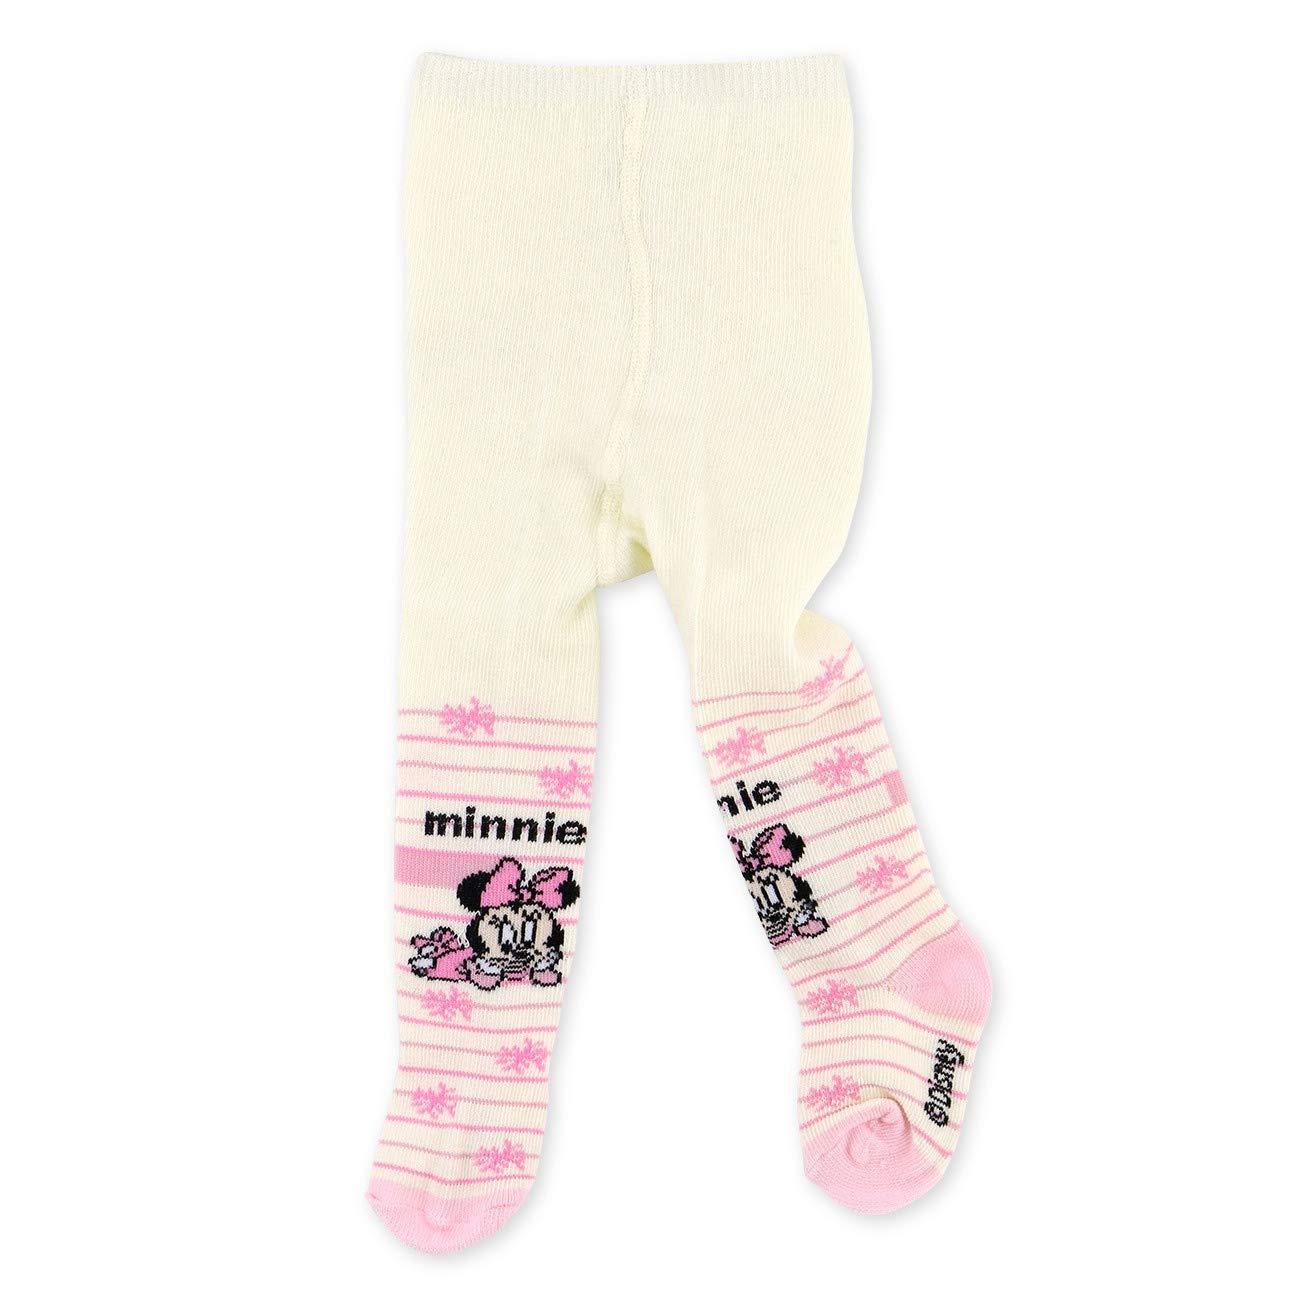 98//104 Disney Minnie Mouse Strumpfhose creme 24-36 Monate